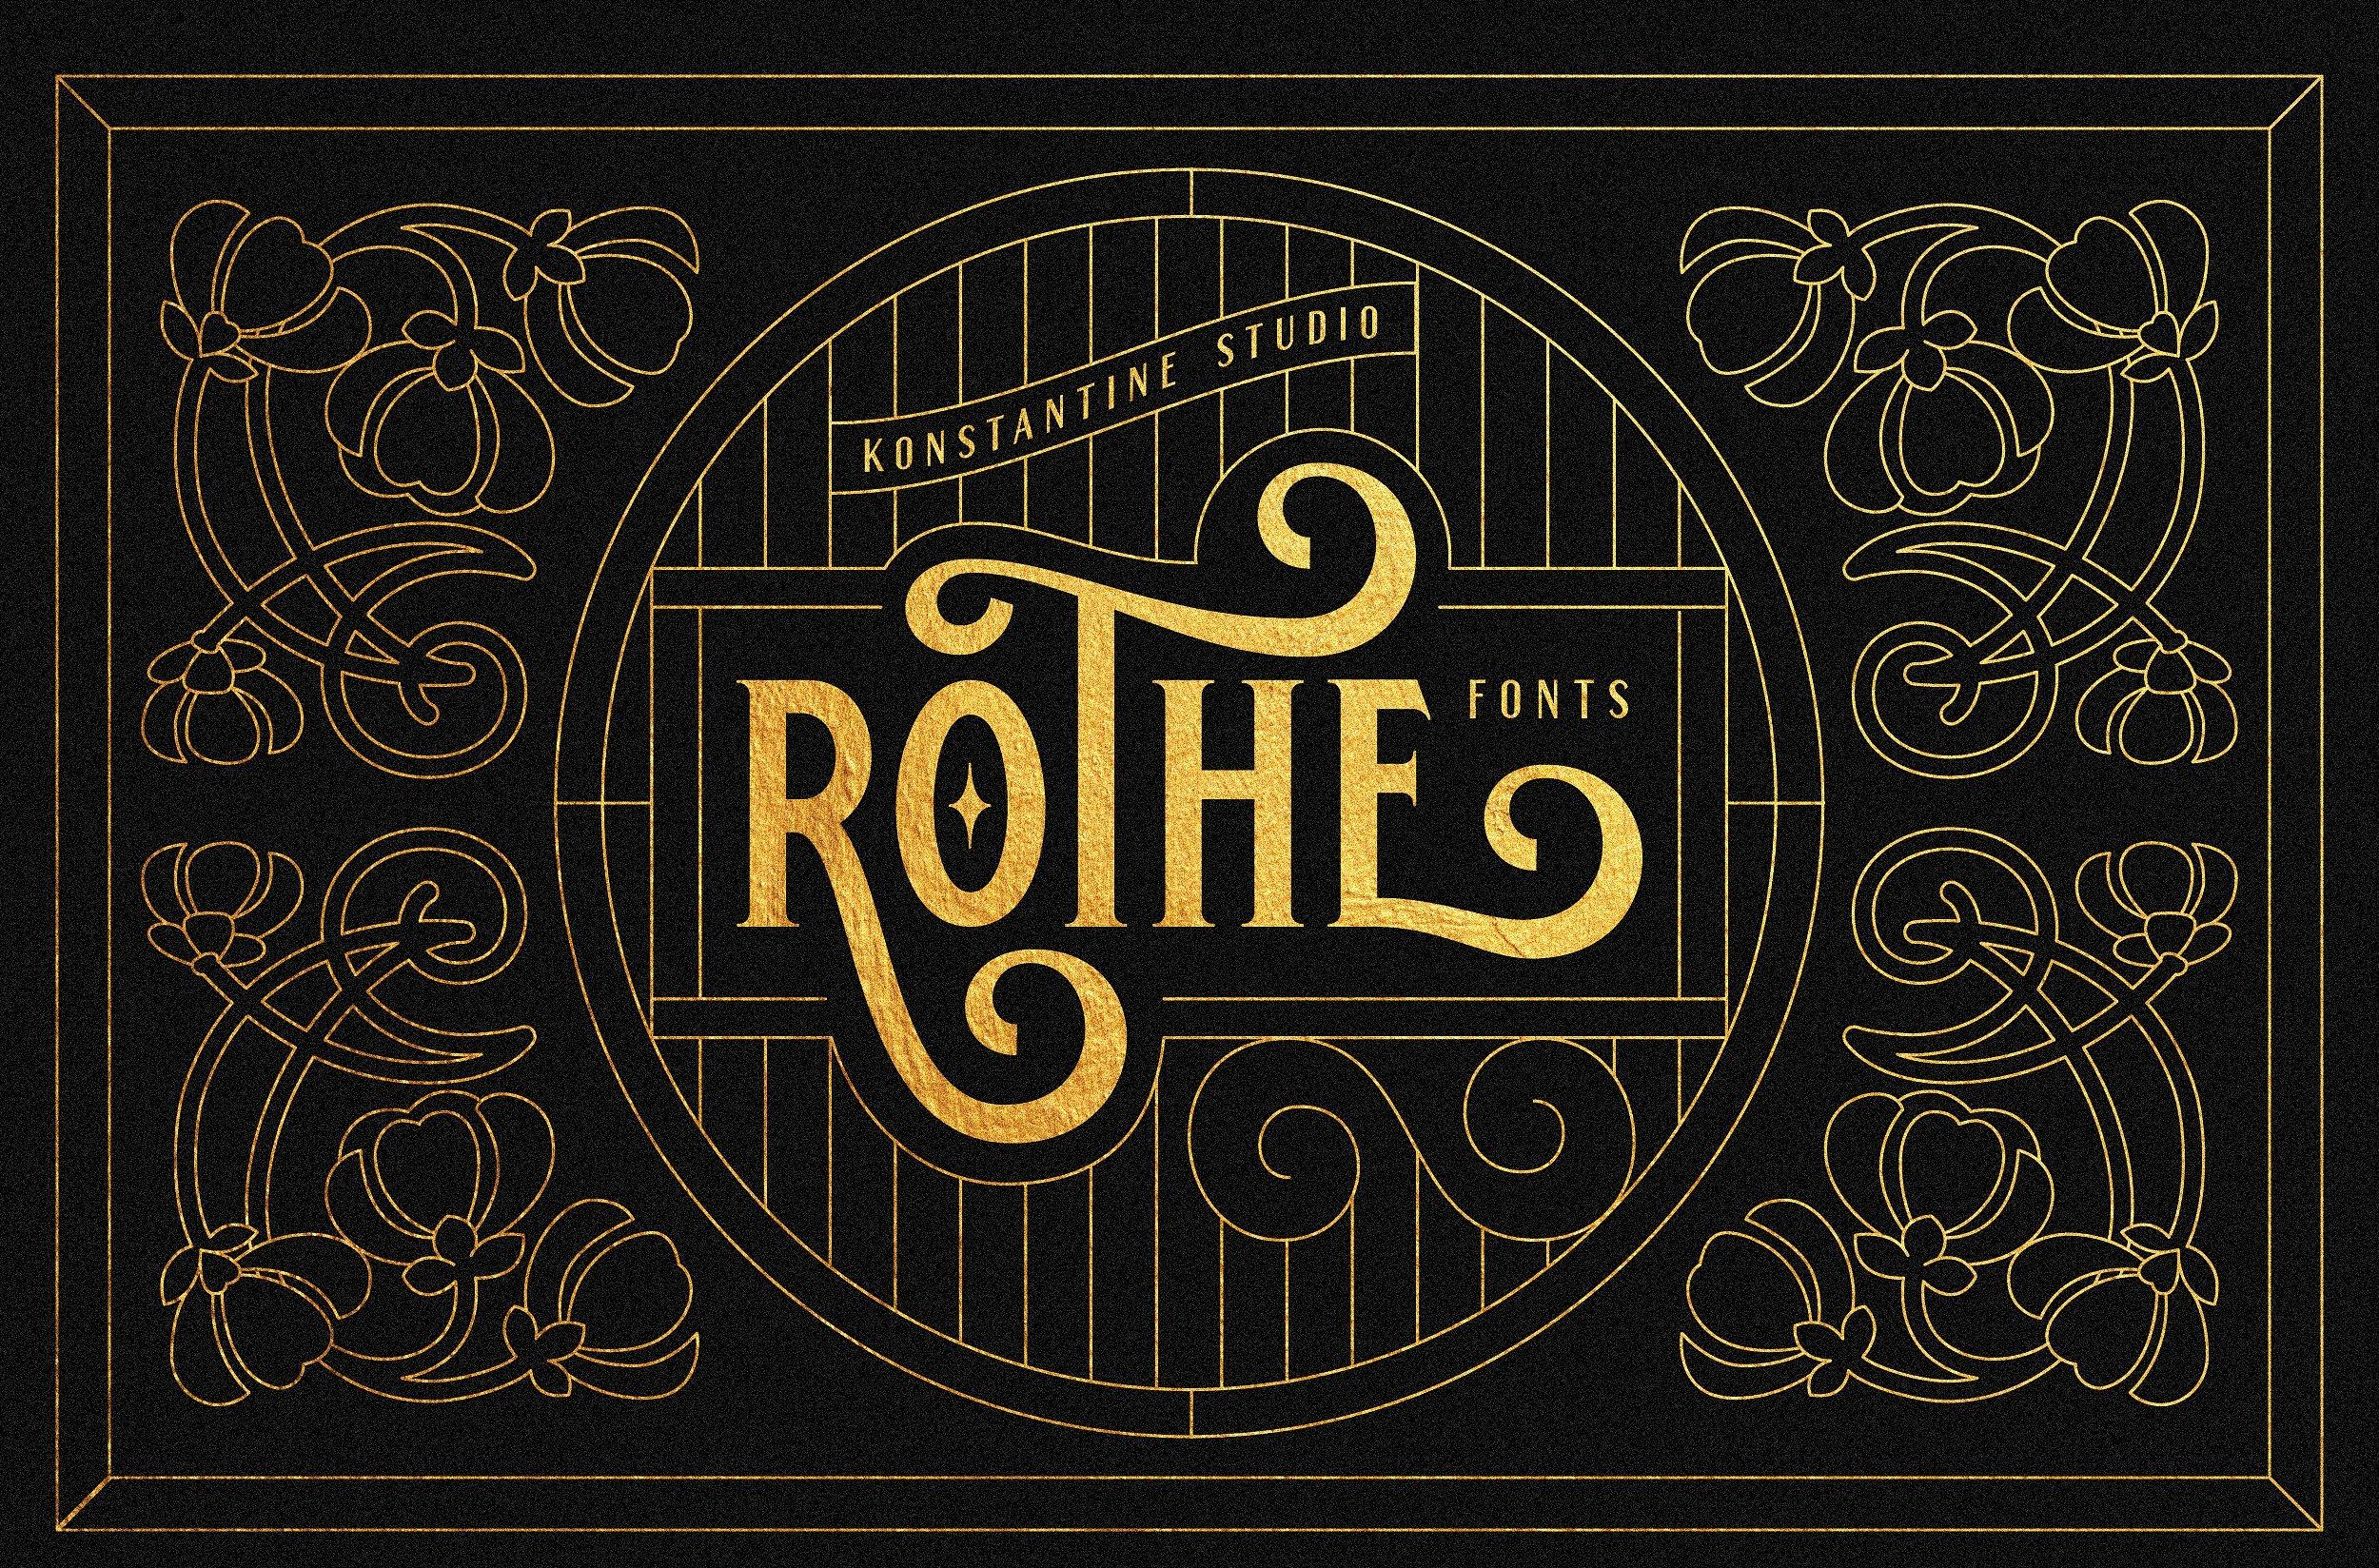 ROTHE Vintage